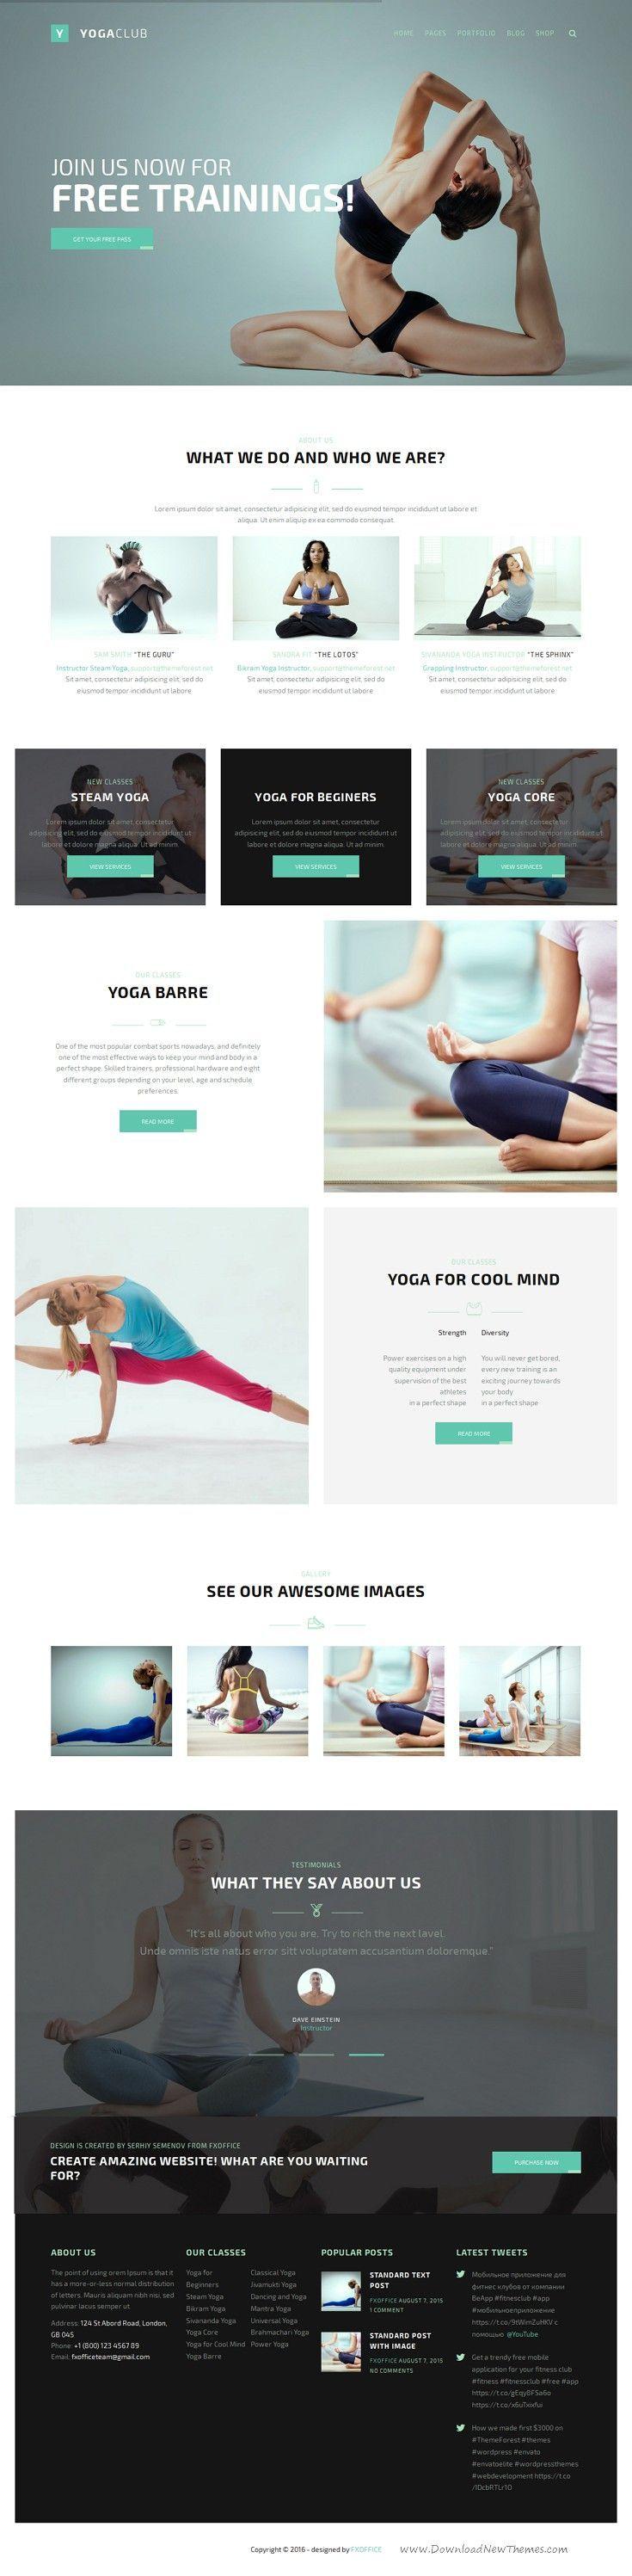 Fightclub premium crossfit mma bodybuilding fitness yoga html template